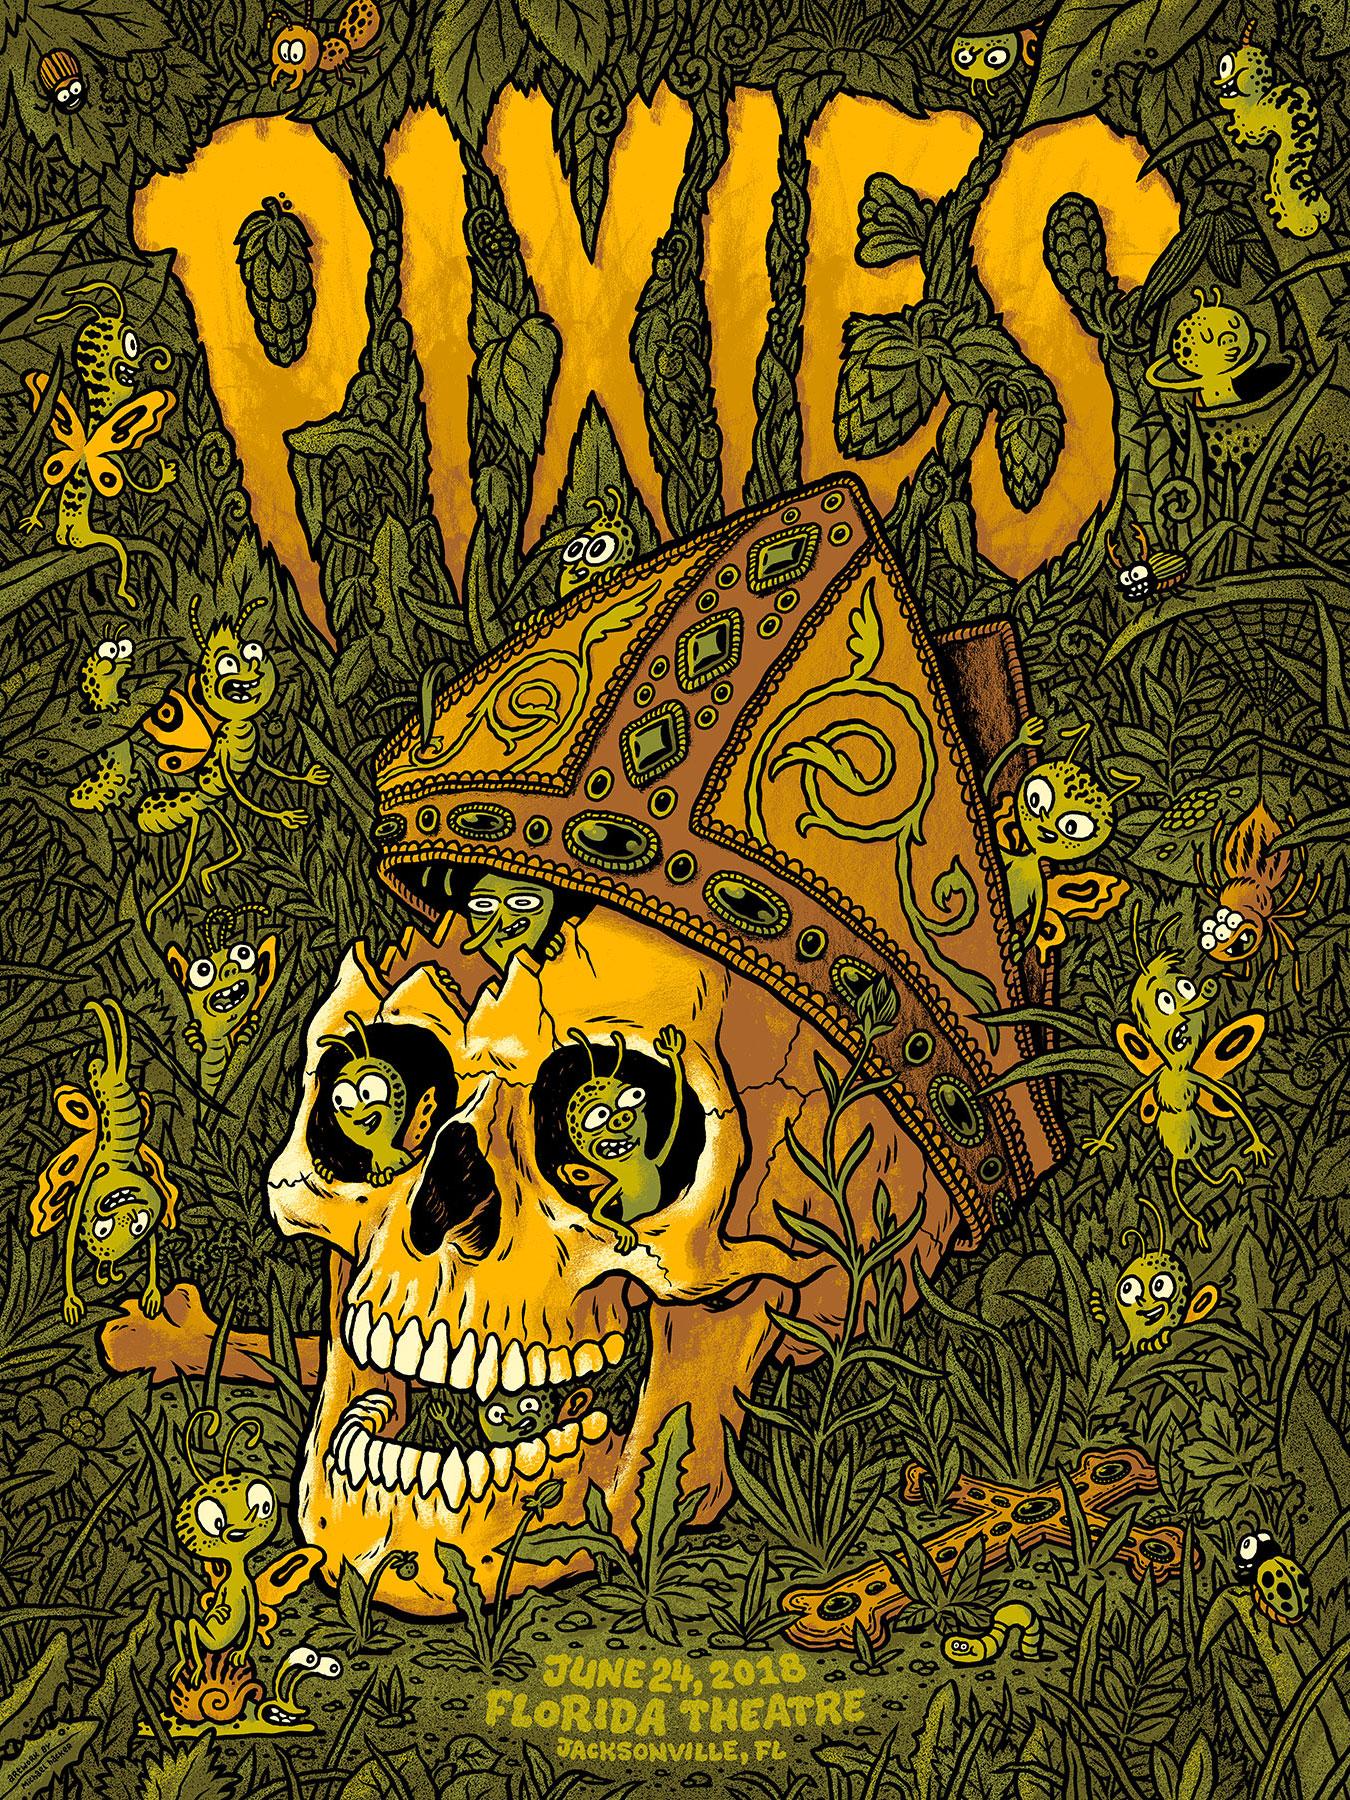 Michael Hacker Pixies Poster